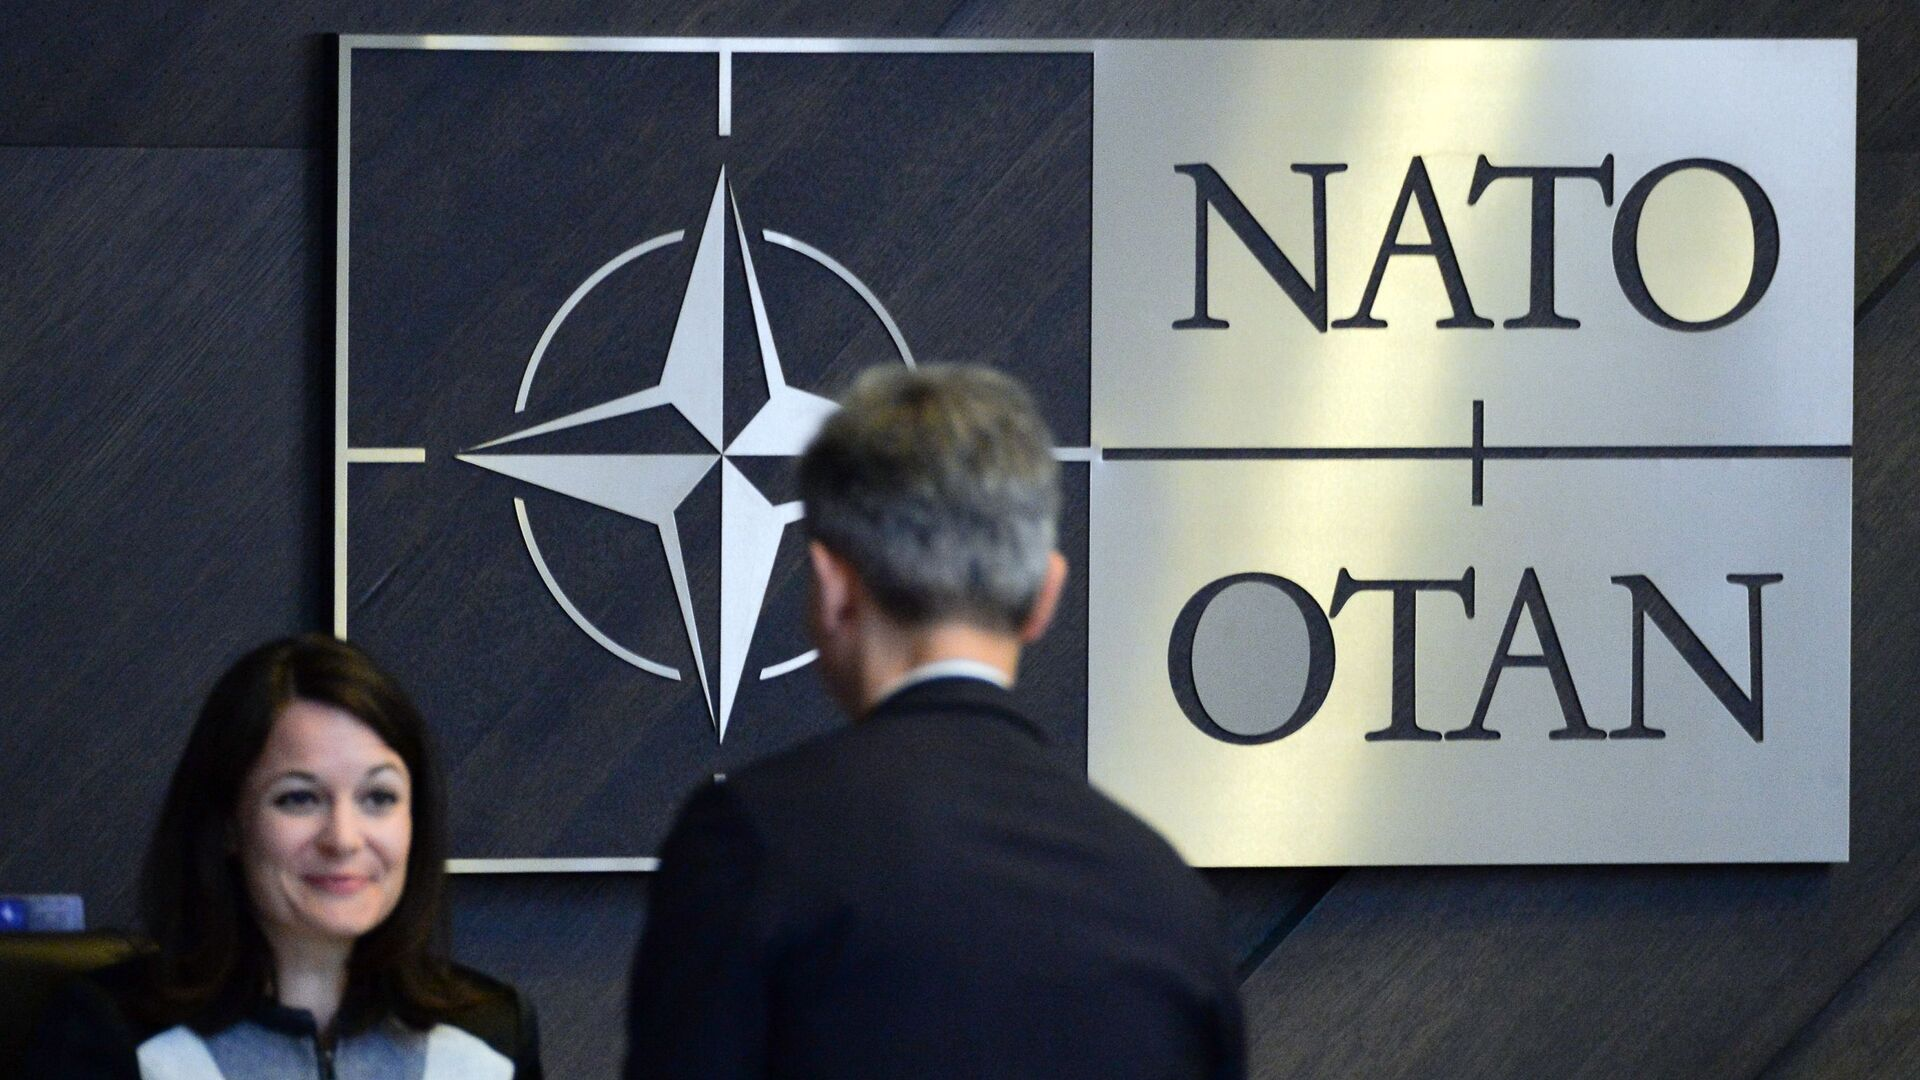 Trụ sở NATO tại Brussels - Sputnik Việt Nam, 1920, 15.06.2021